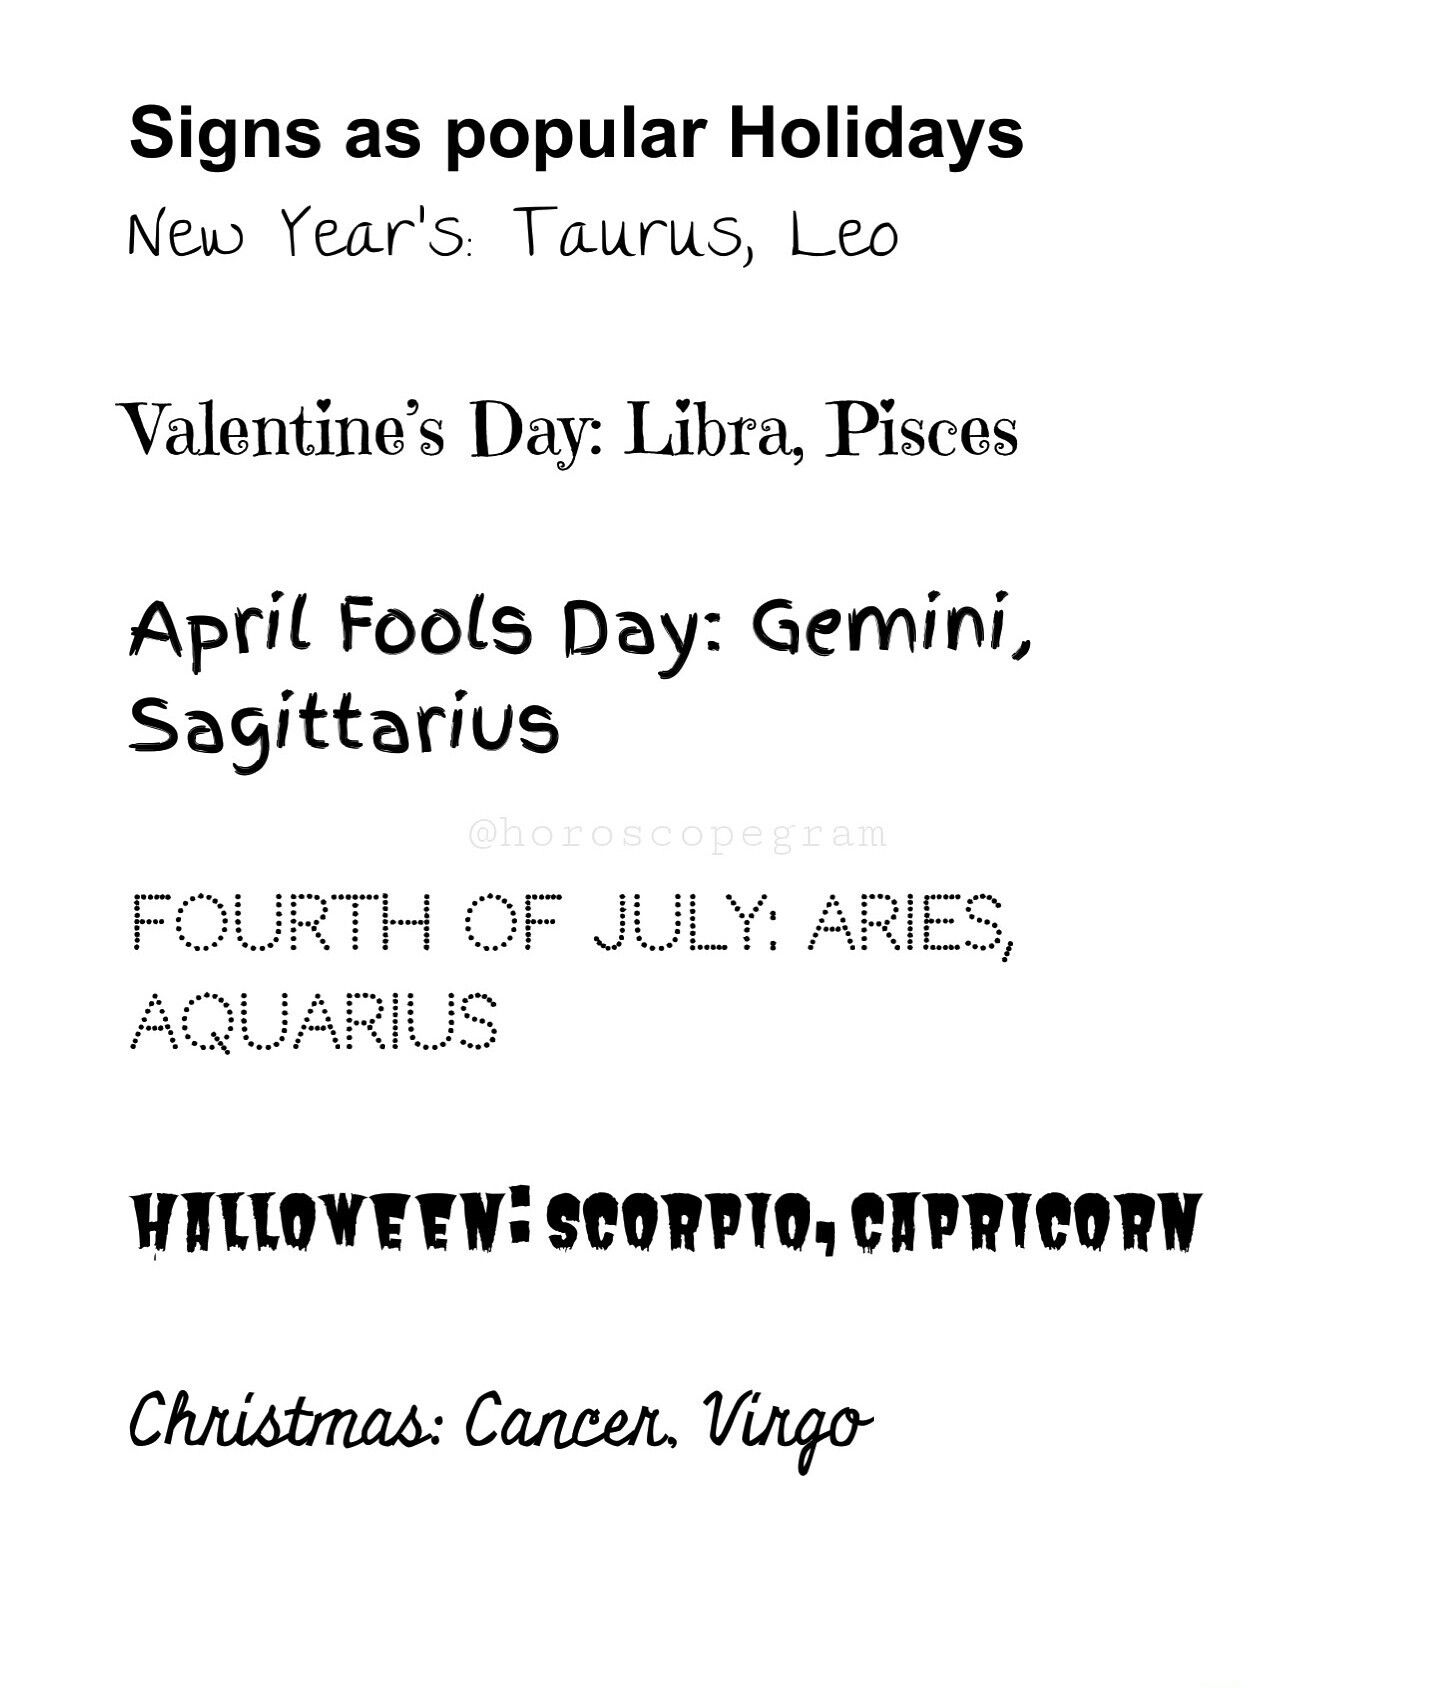 Oh yeah, April Fools Day here I come! #Sagittarius | Libra ...